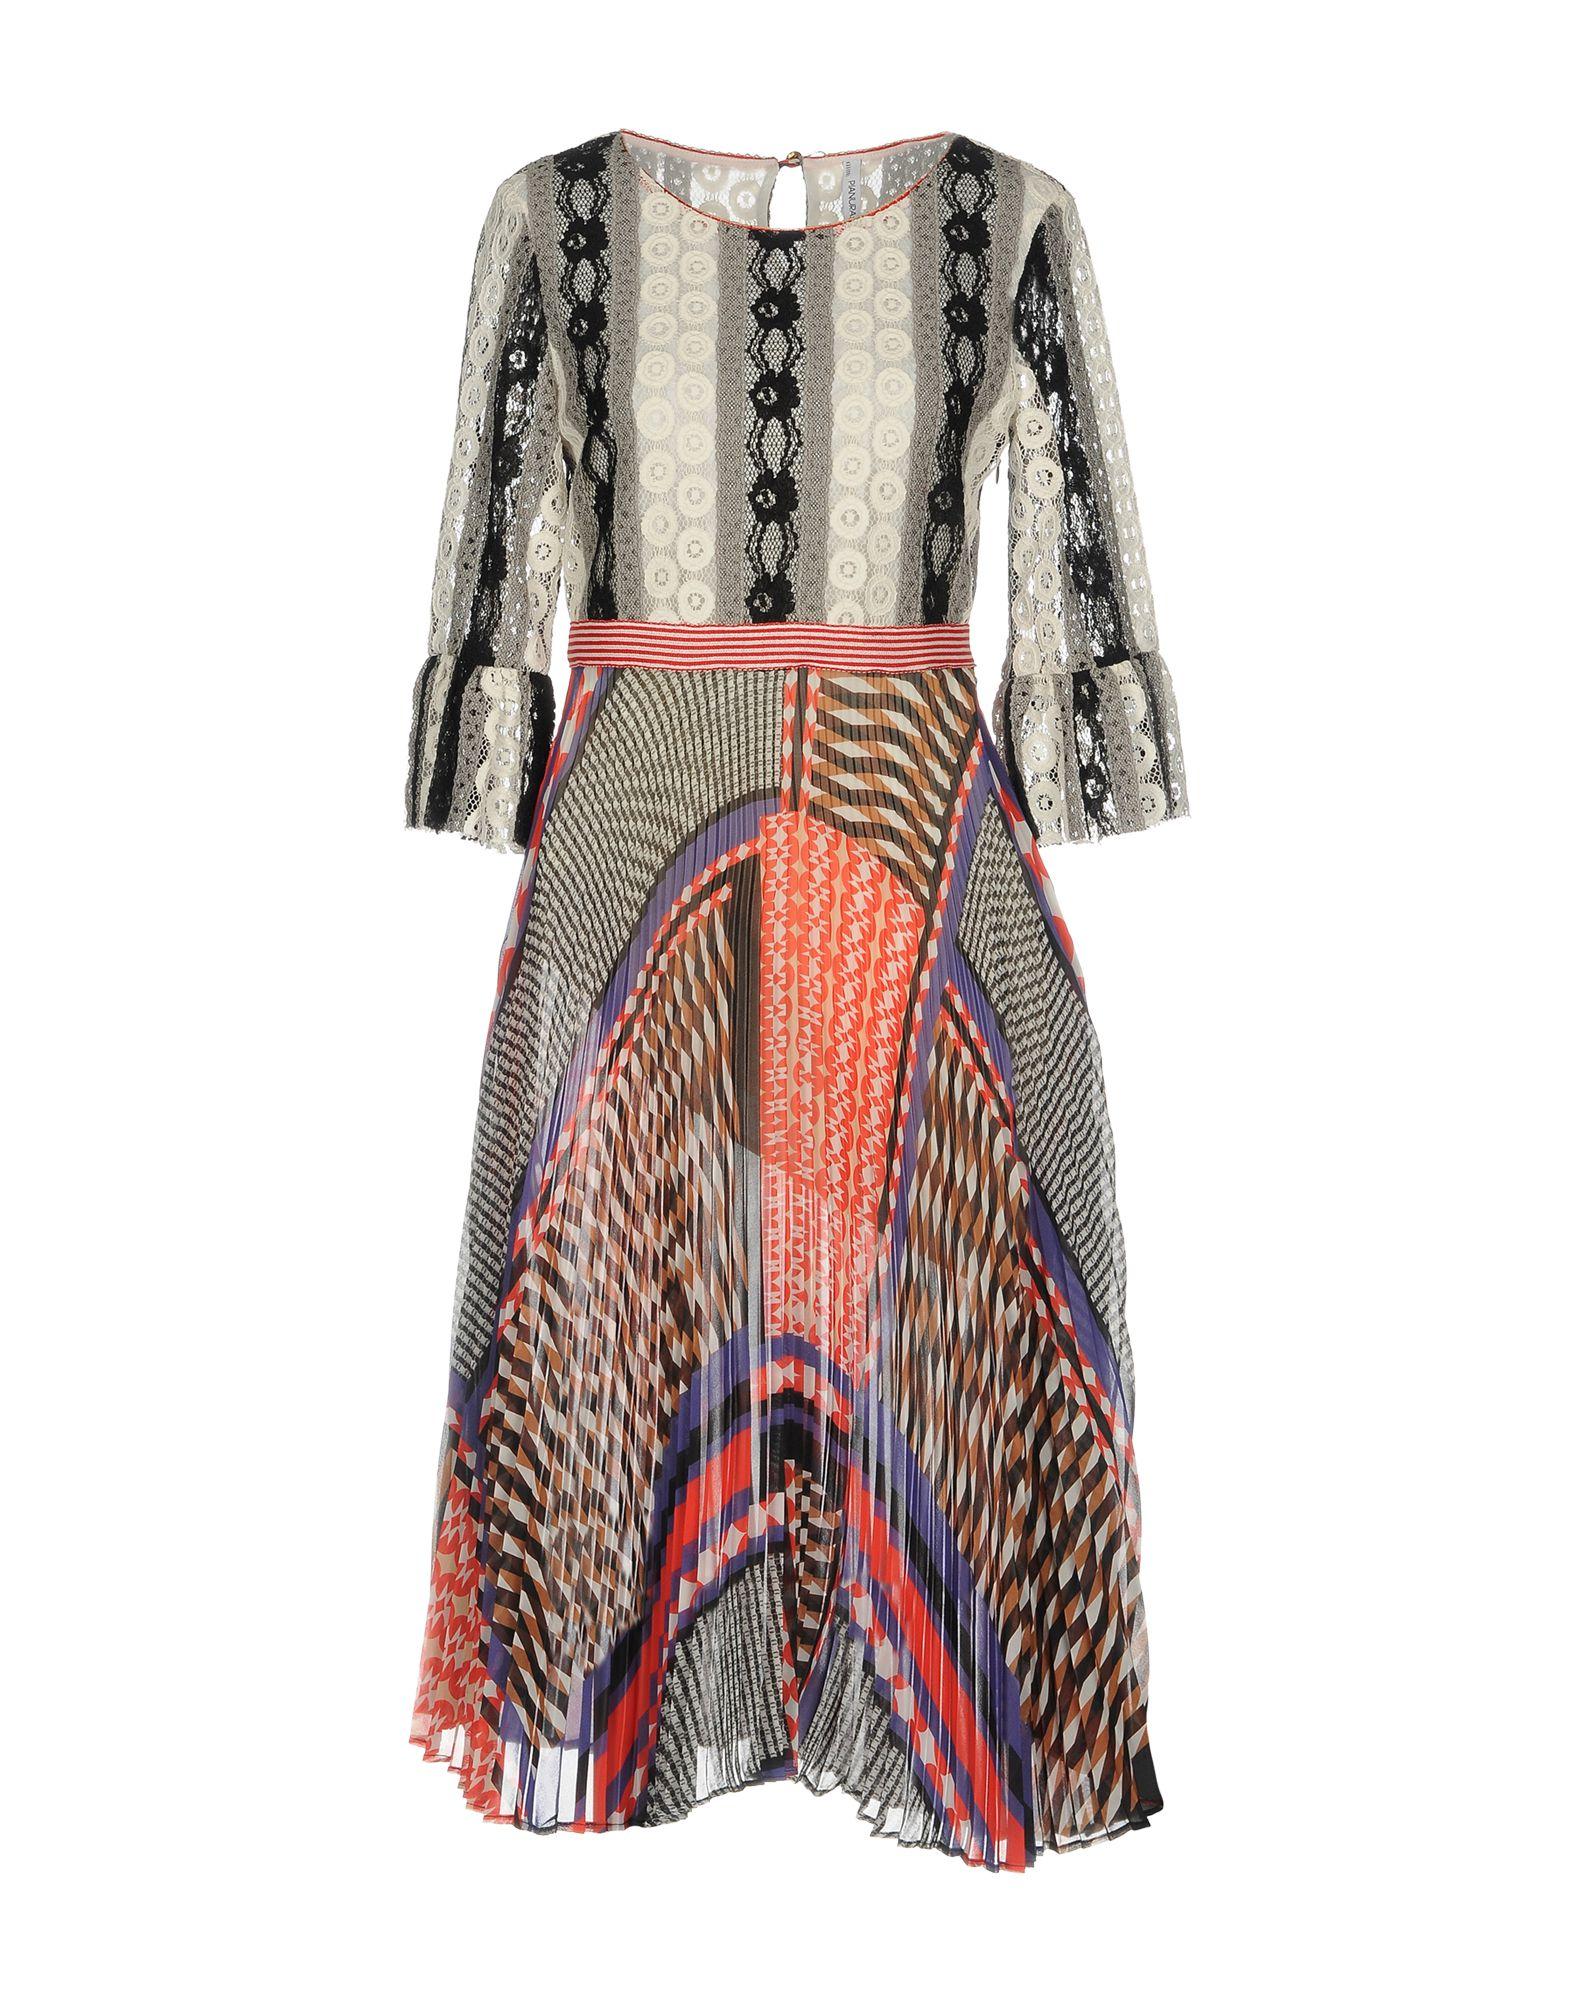 PIANURASTUDIO Платье длиной 3/4 dc shoes ремень dc shoes chinook washed indigo fw17 one size